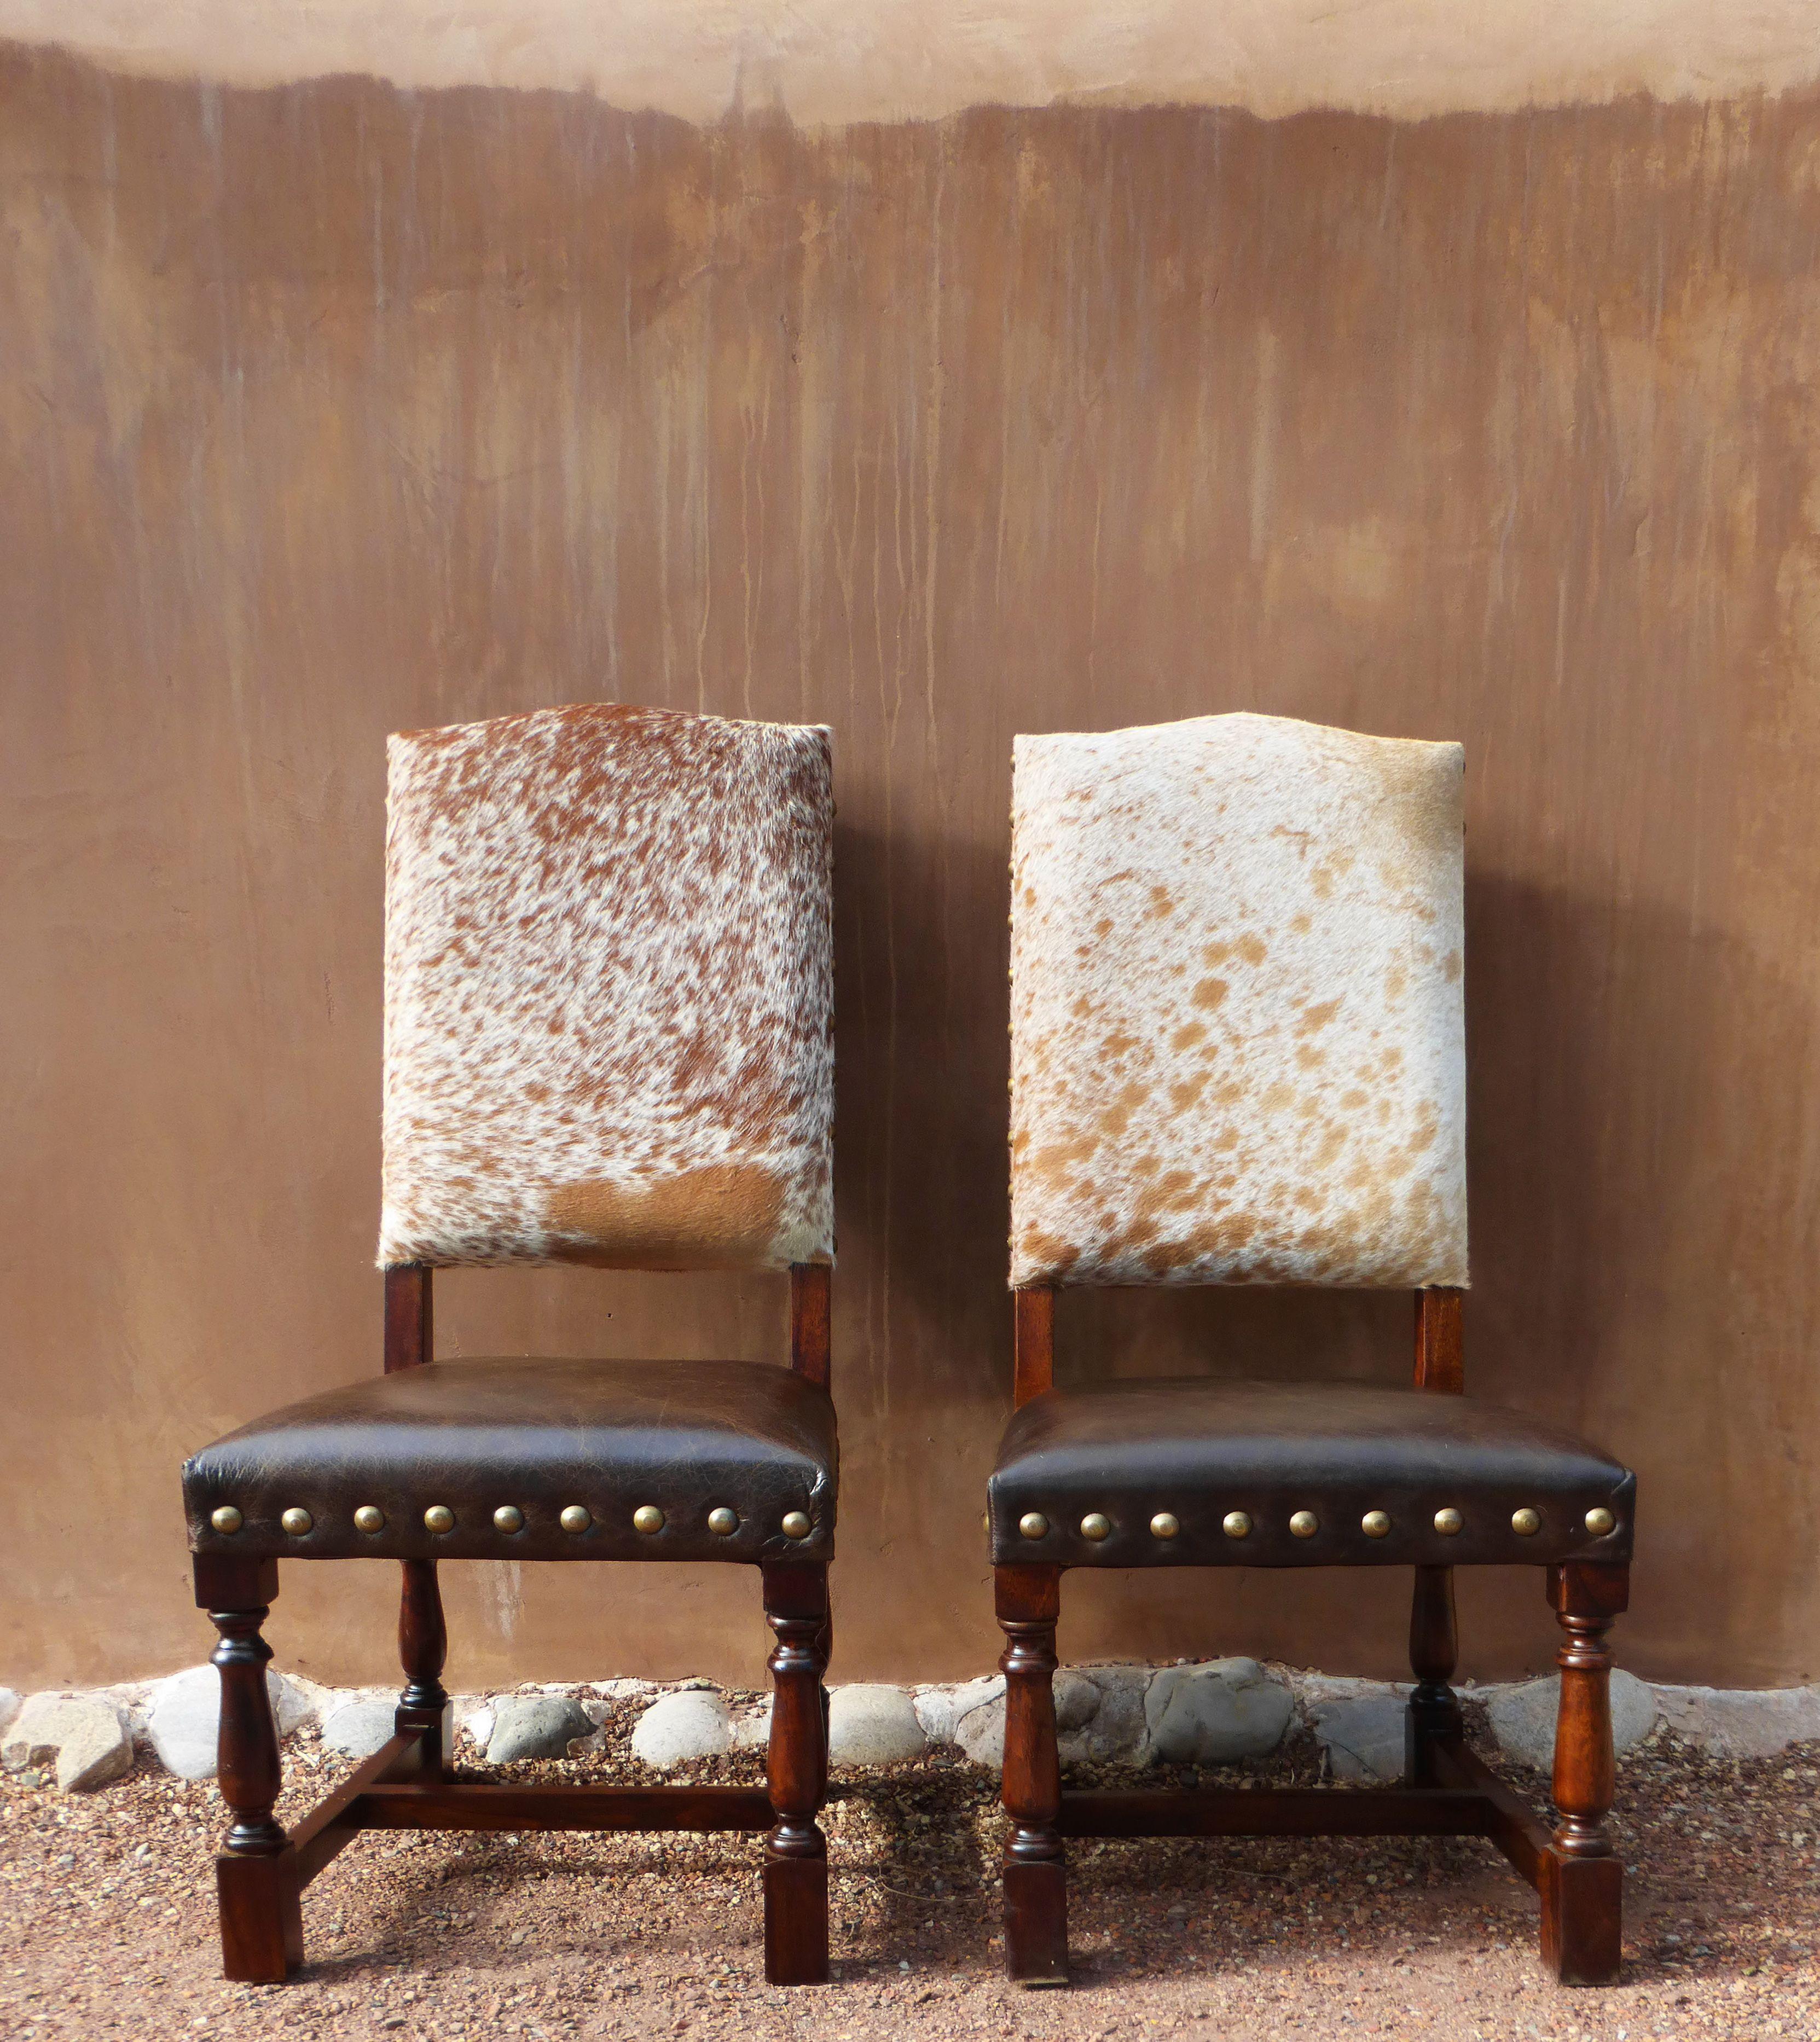 Cowhide Chairs | Cowhide Chairs + Cowhide Bar Stools + ...